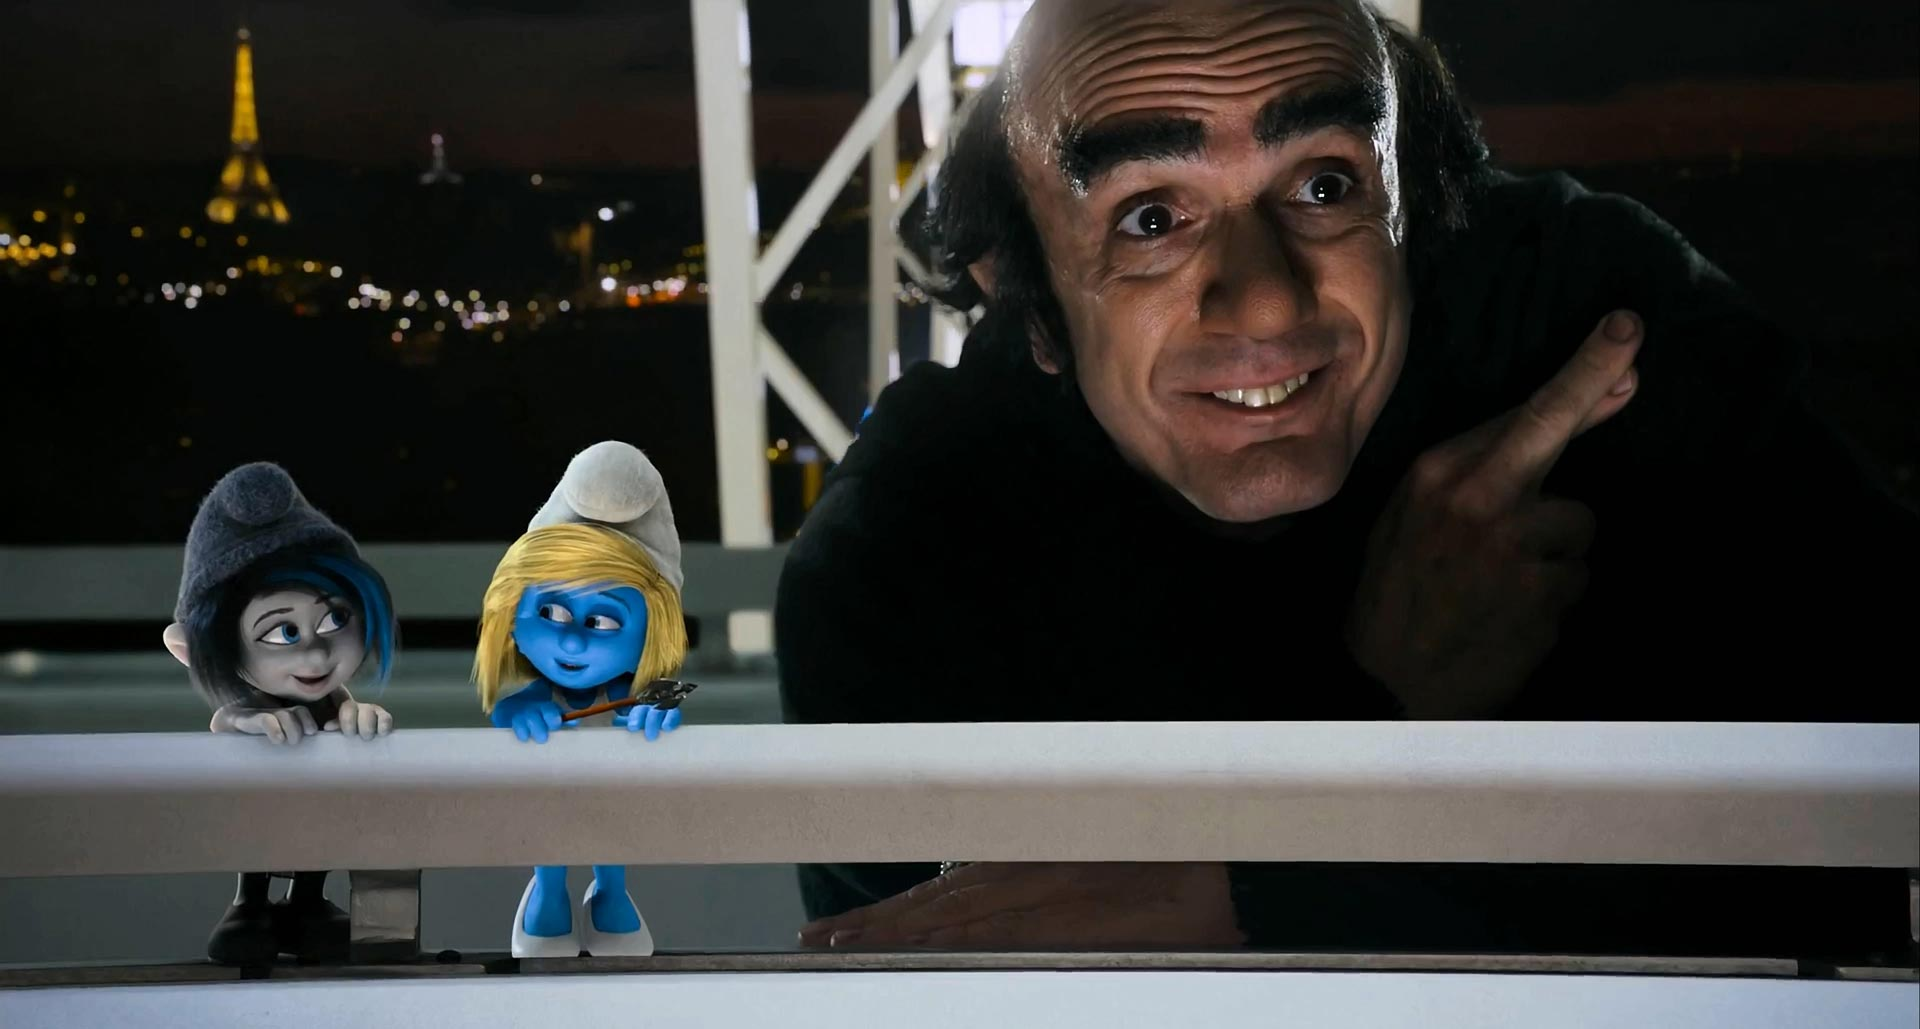 The Smurfs 2 Movie Still 117975